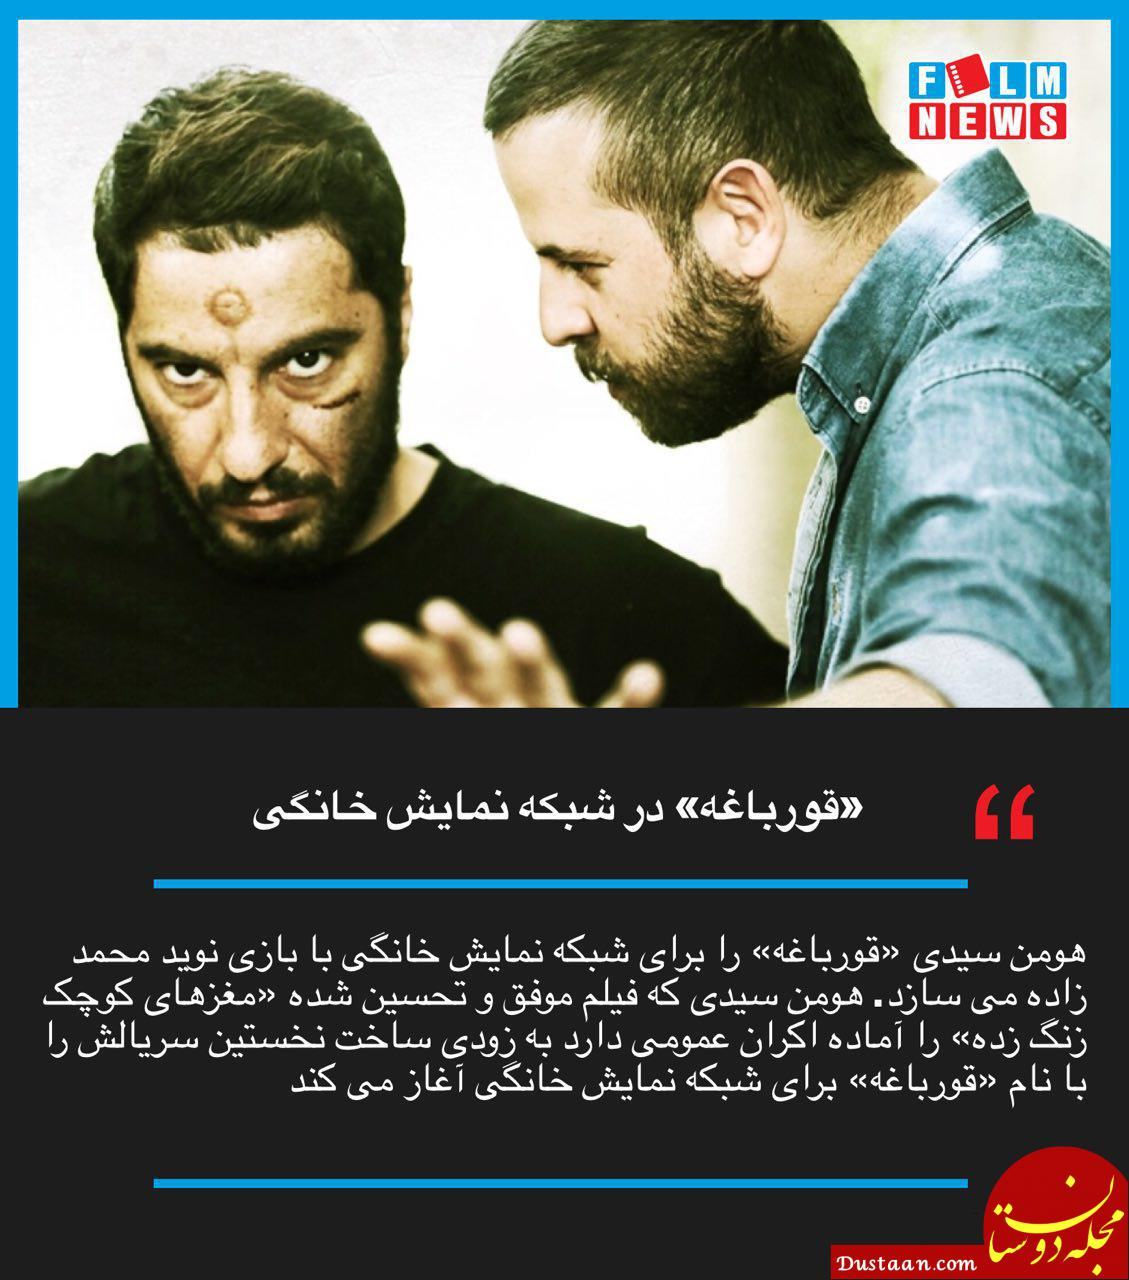 www.dustaan.com هومن سیدی سریال «قورباغه» را با بازی نوید محمدزاده می سازد +عکس